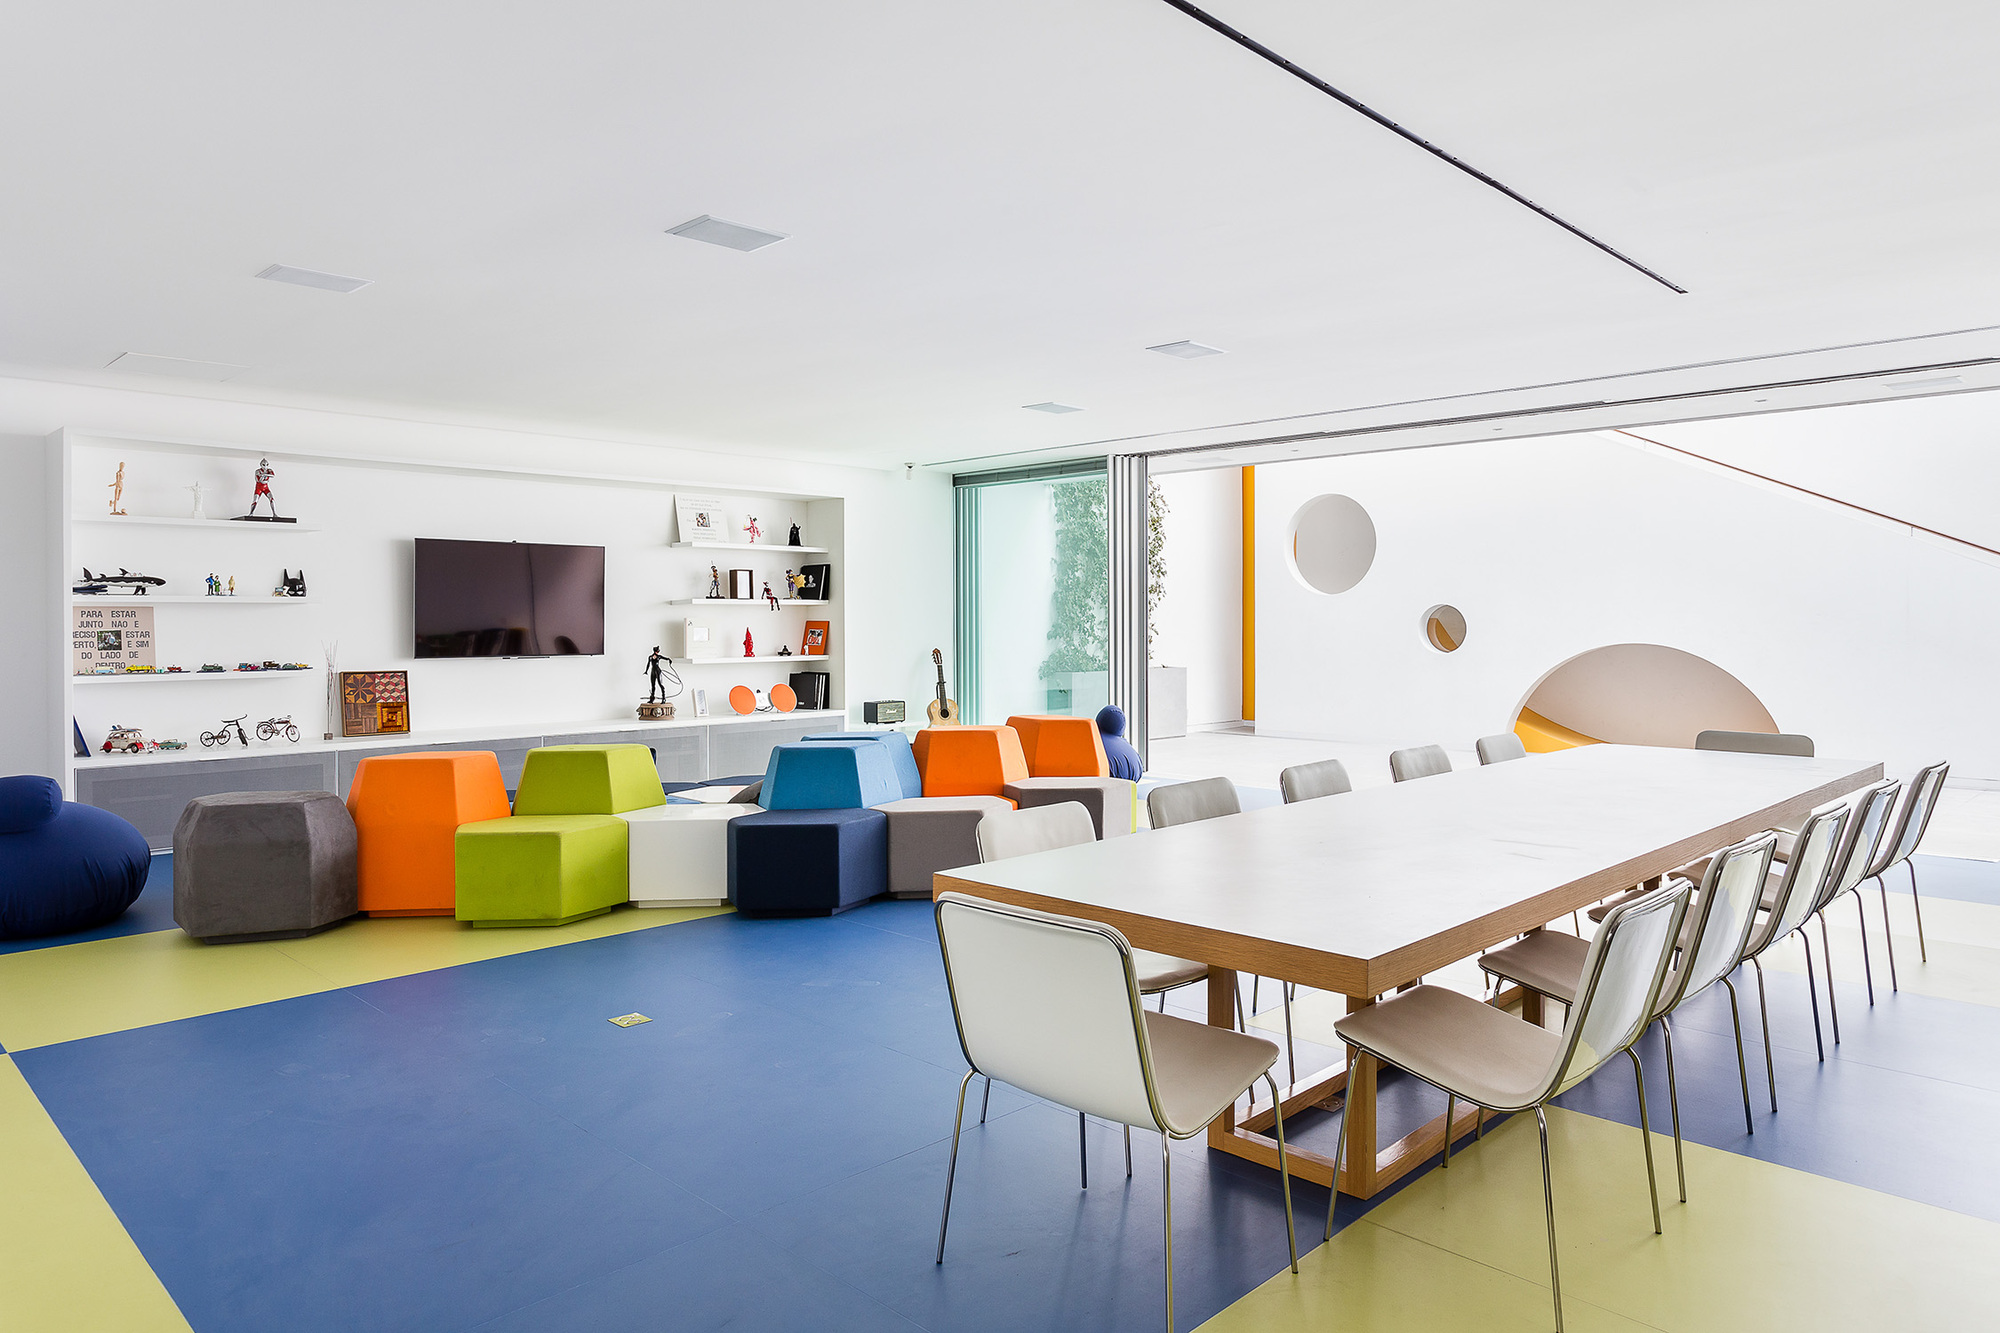 Galeria de brinquedoteca pascali semerdjian arquitetos 7 - Maison insolite la toy house par pascali semerdjian architects ...